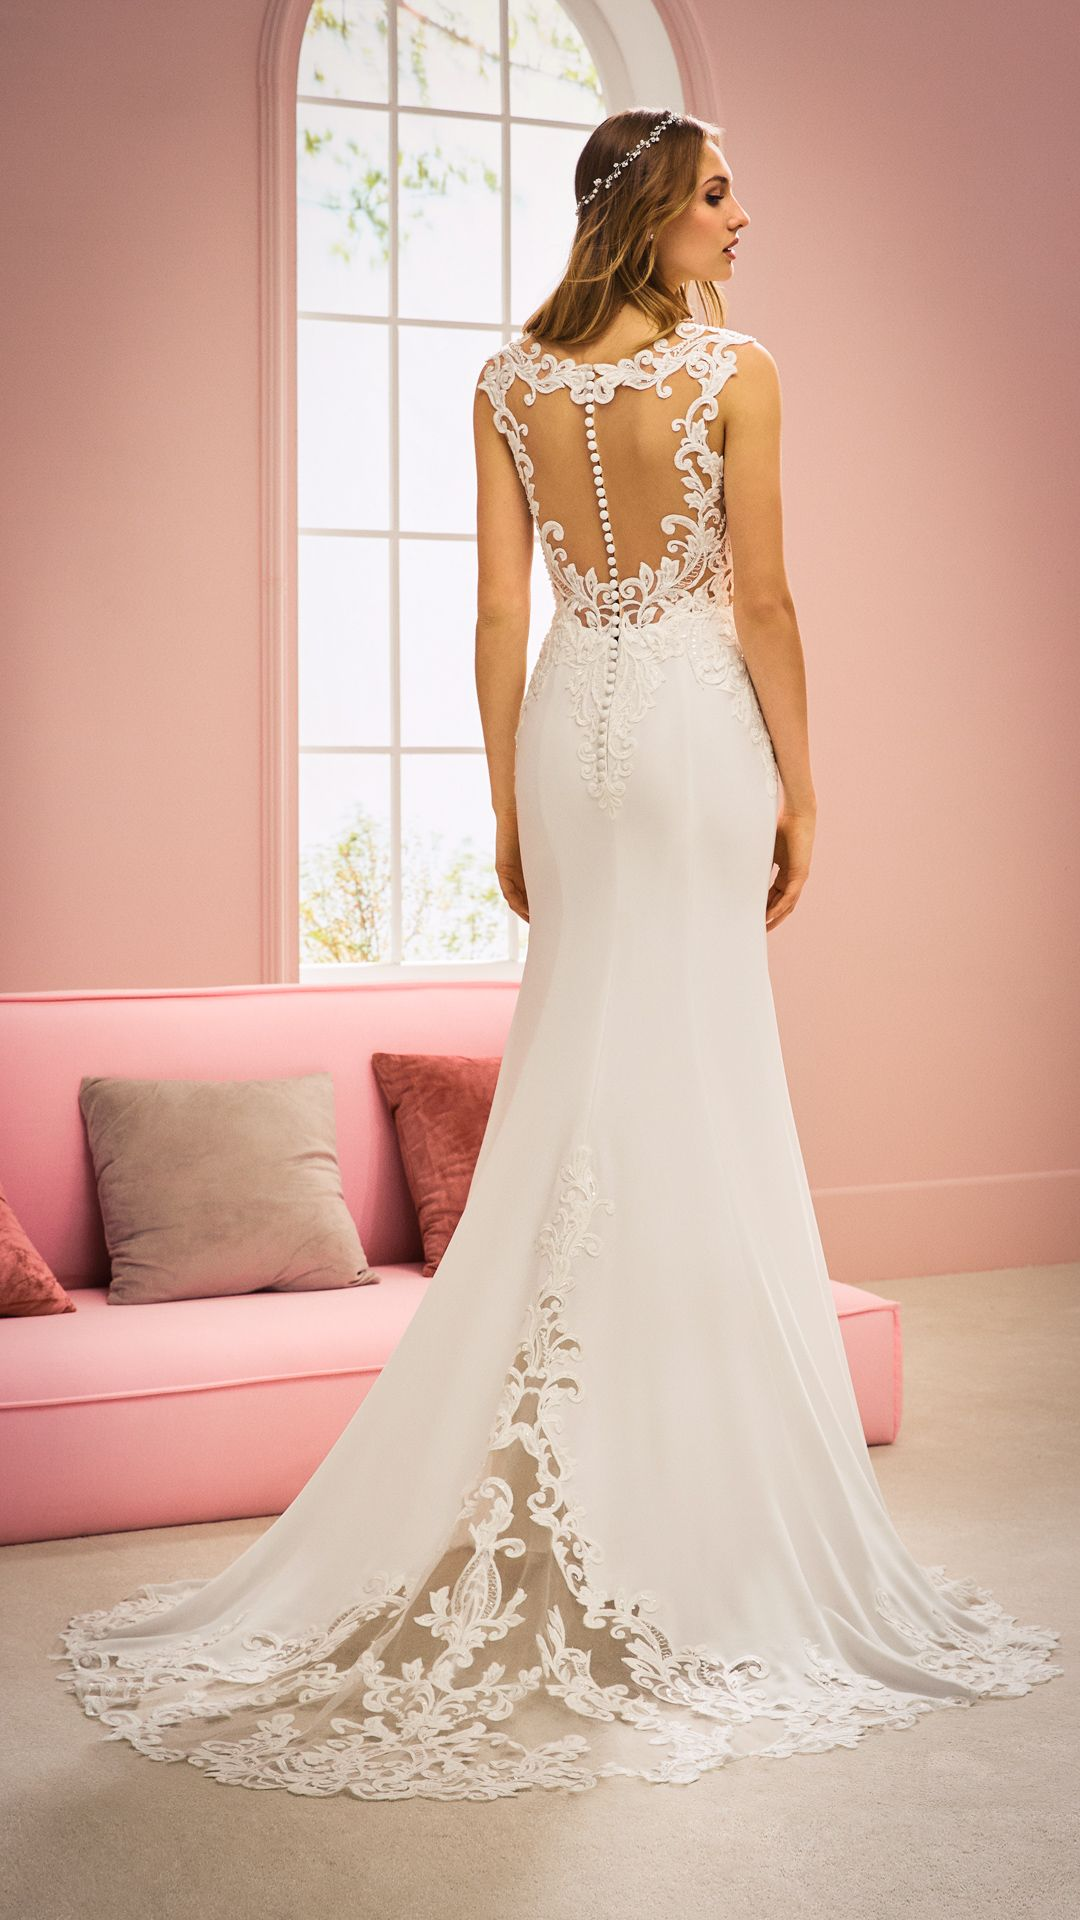 Hochzeitskleider 10 White One Kollektion Modell: LAVA-C